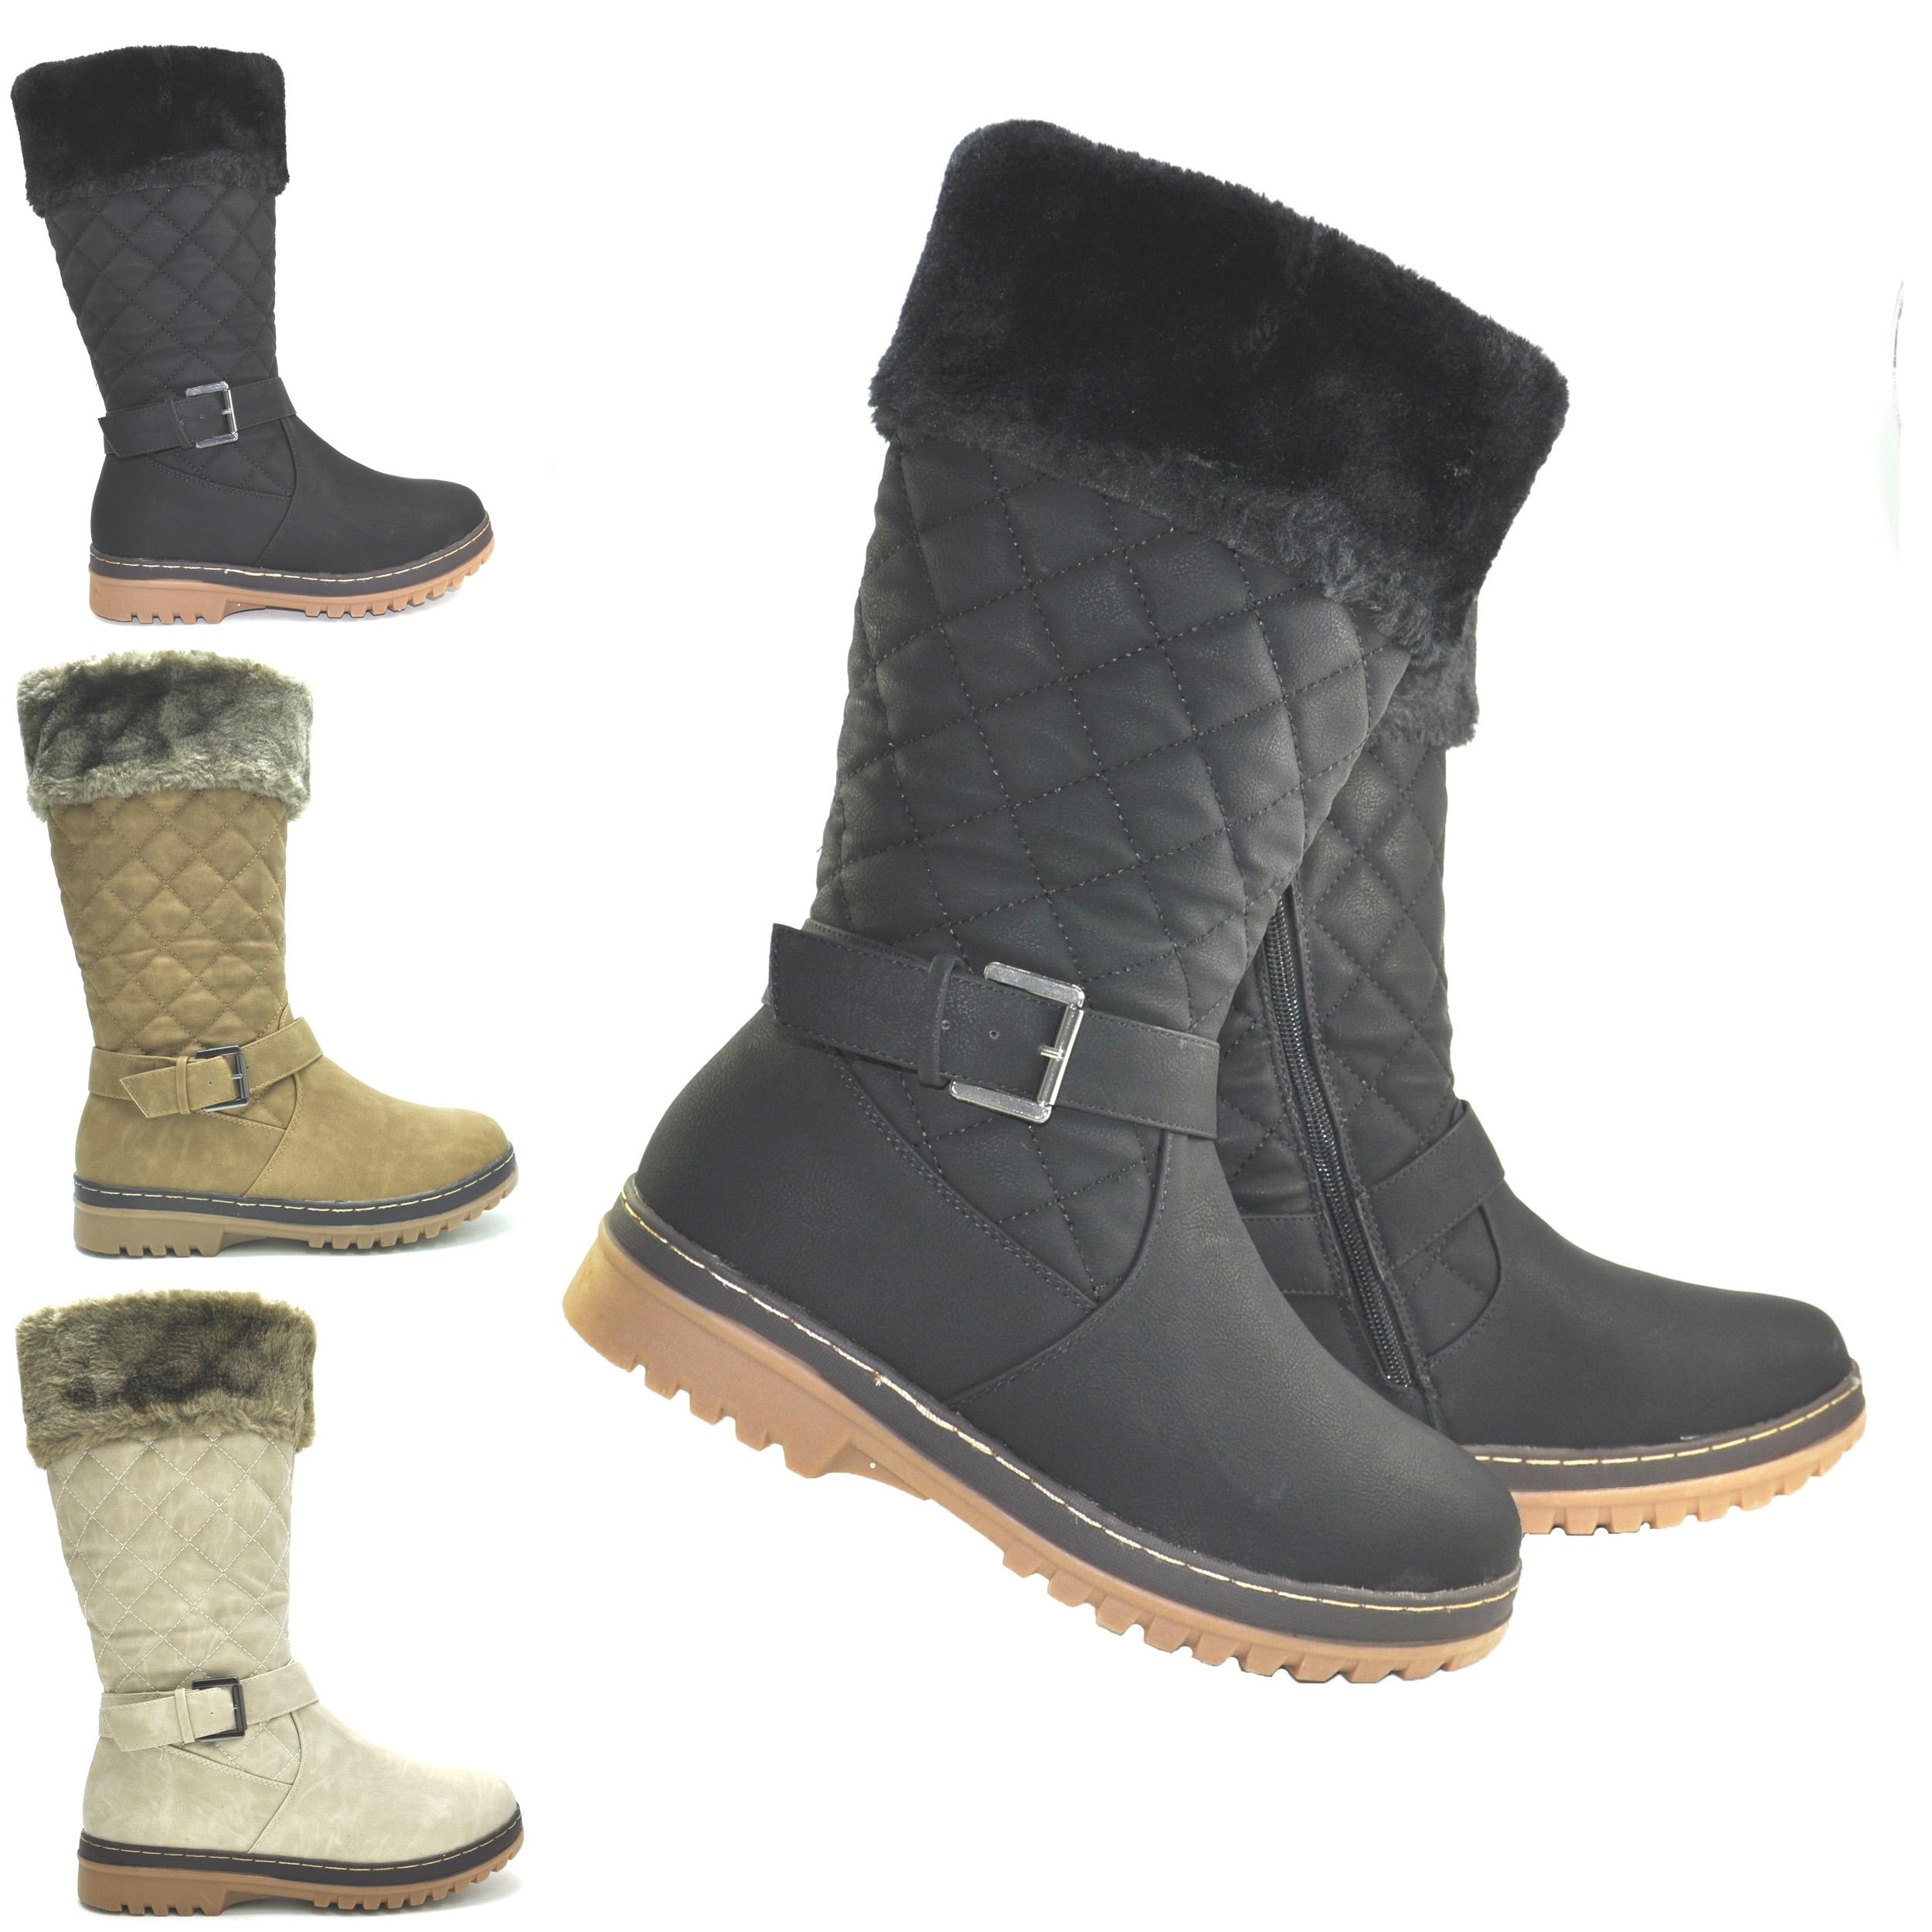 Womens Fashion Boots Size